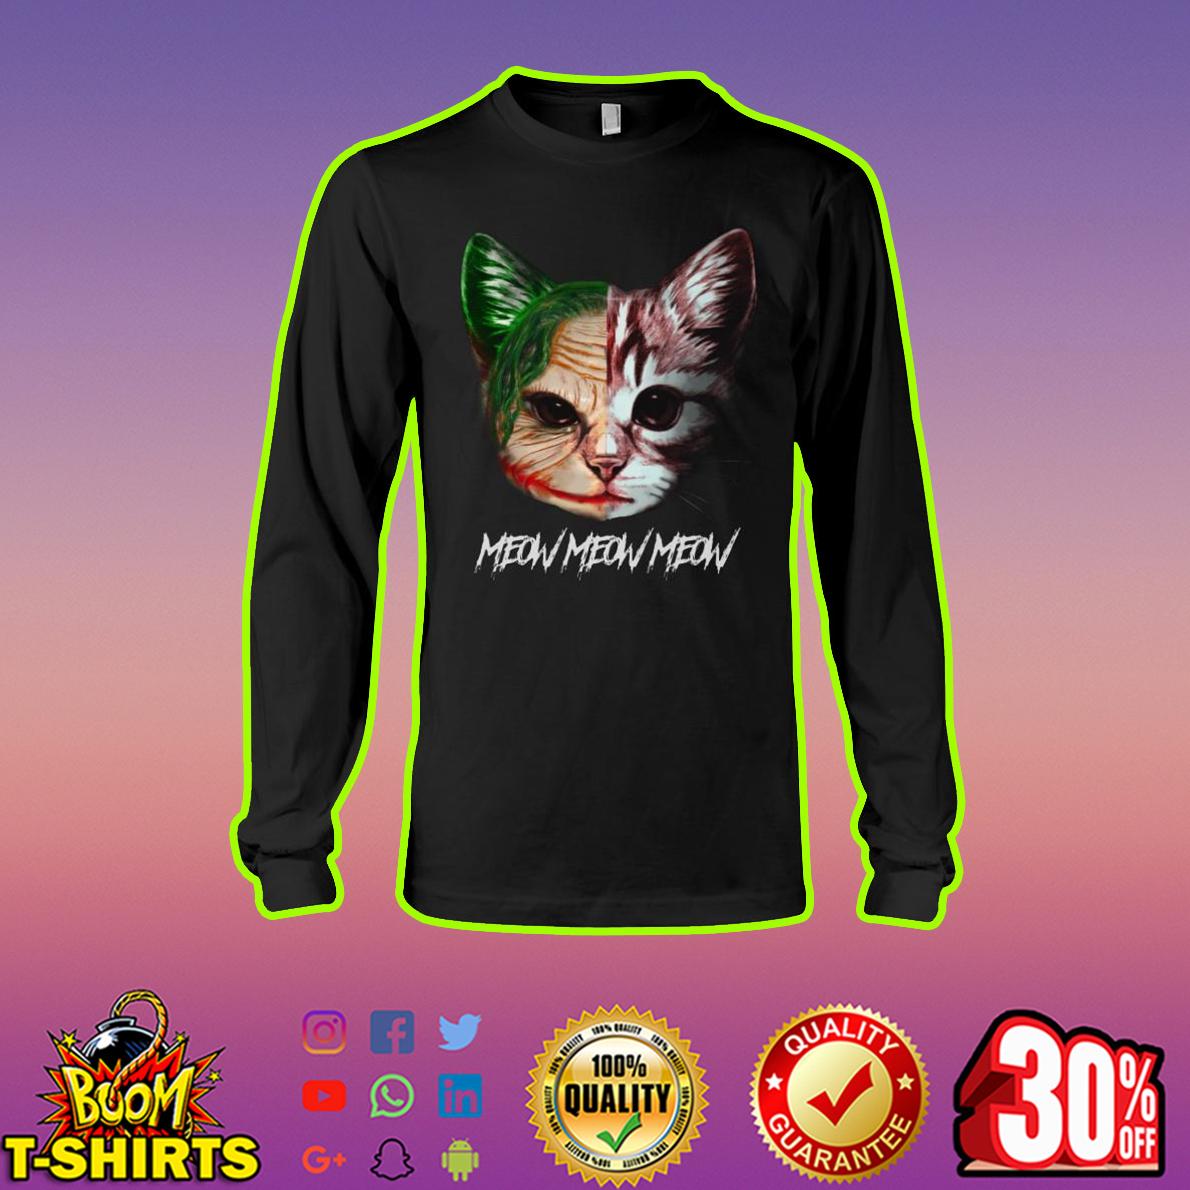 Joker Cat Meow Meow Meow longsleeve tee